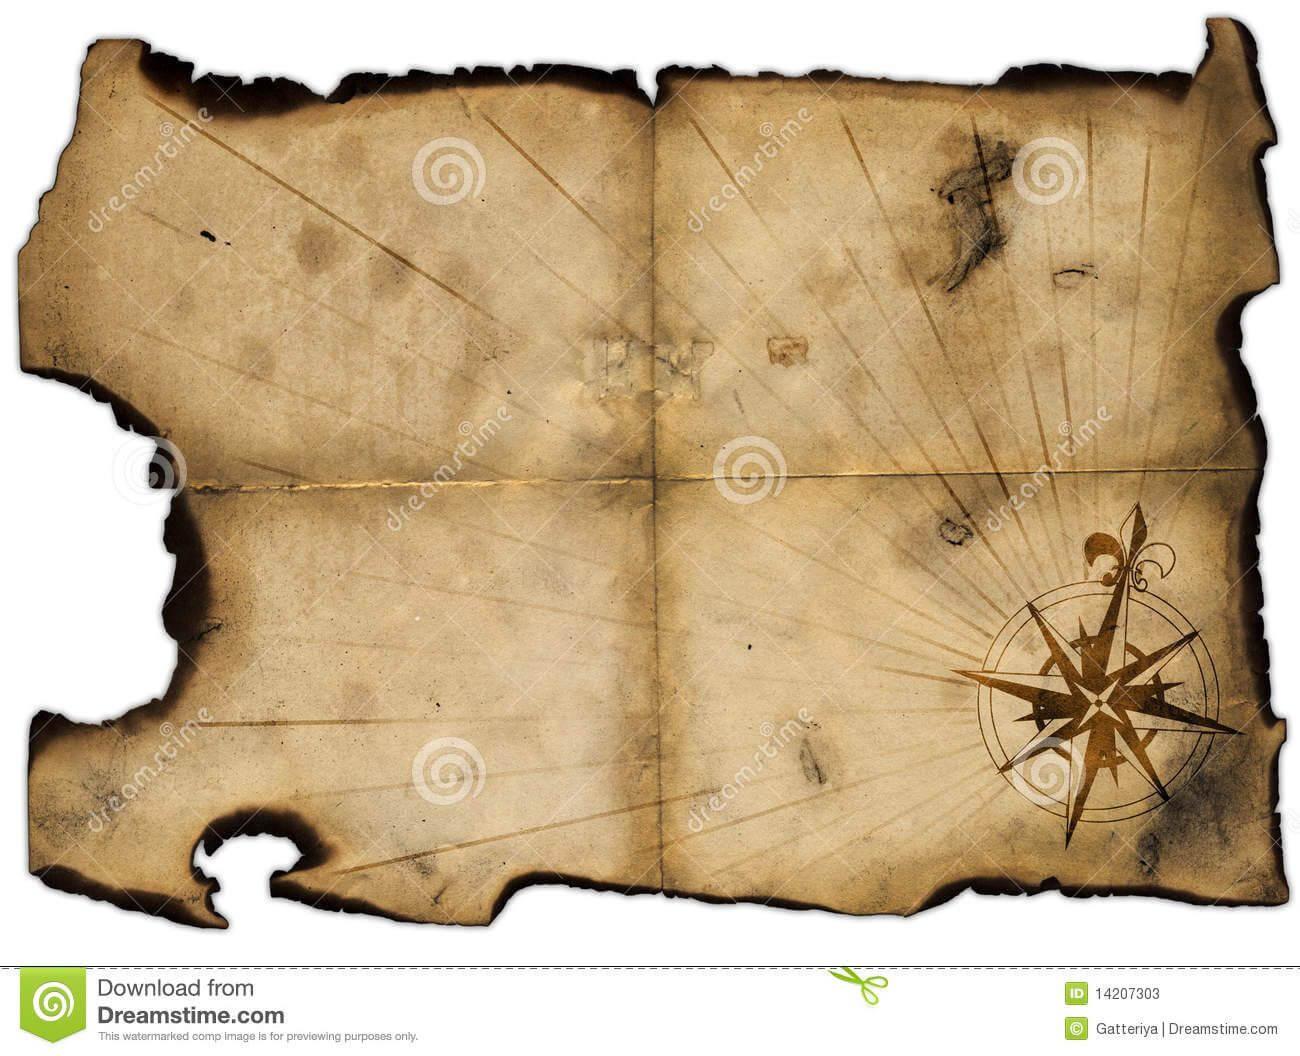 Blank Treasure Map Template - Videotekaalex.tk | Future Ink Pertaining To Blank Pirate Map Template